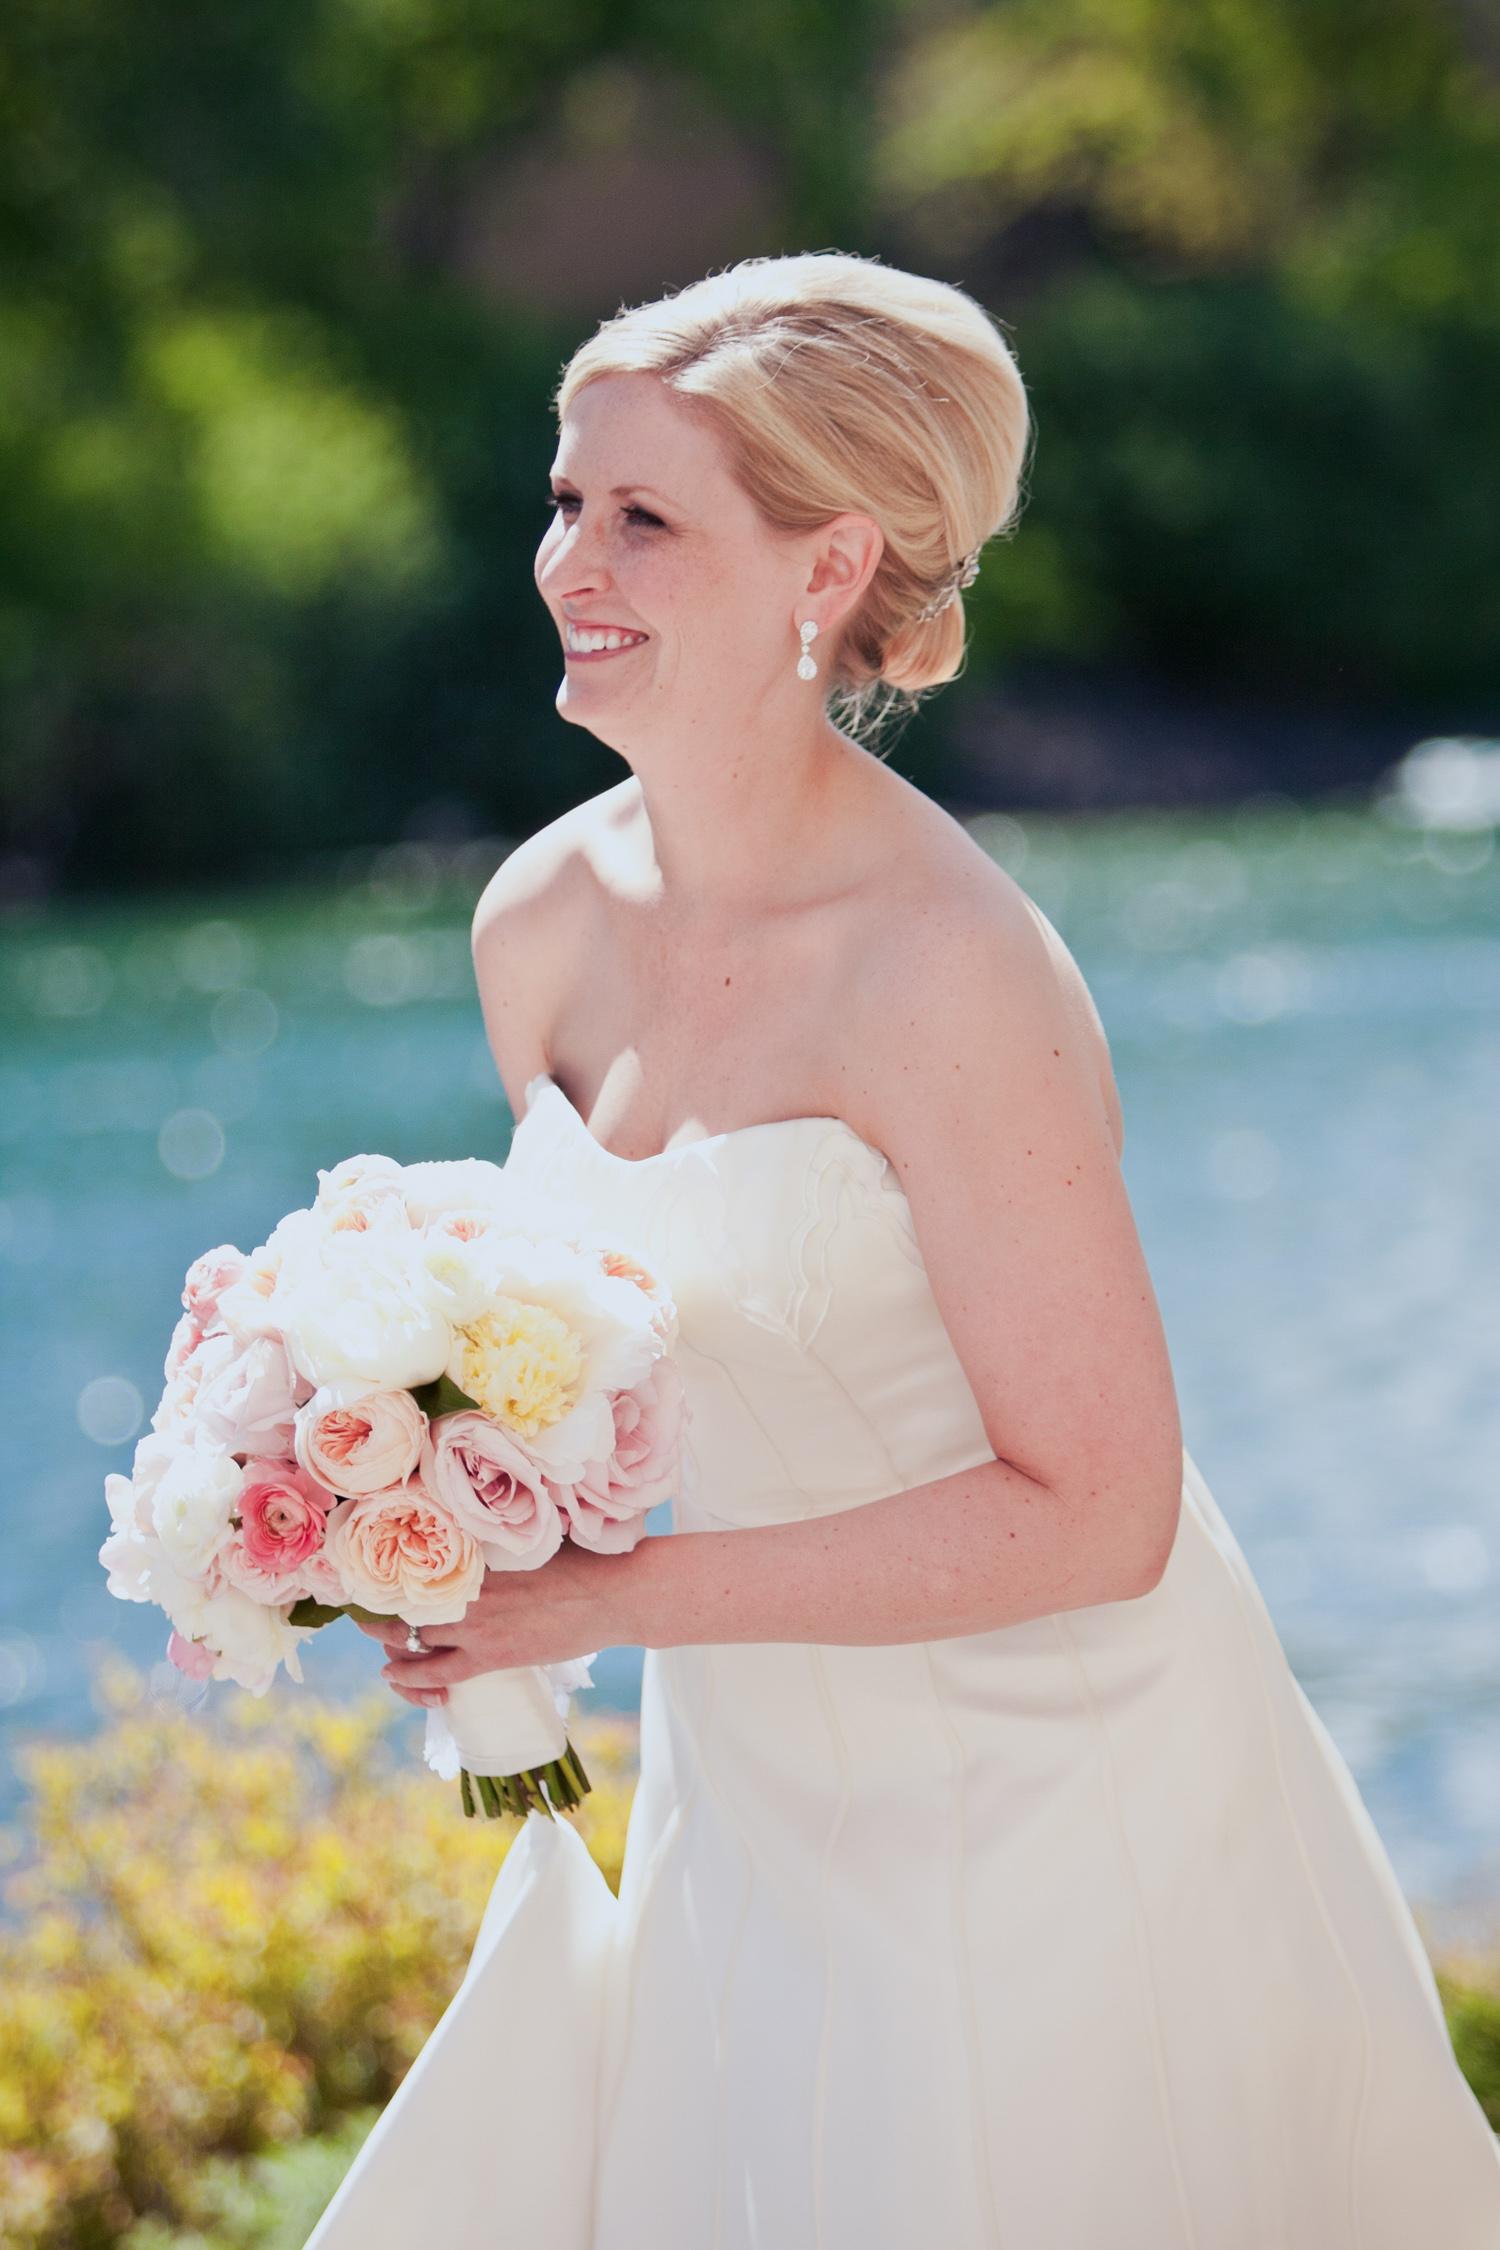 Broadmoor_Wedding_Colorado_Springs_022.JPG